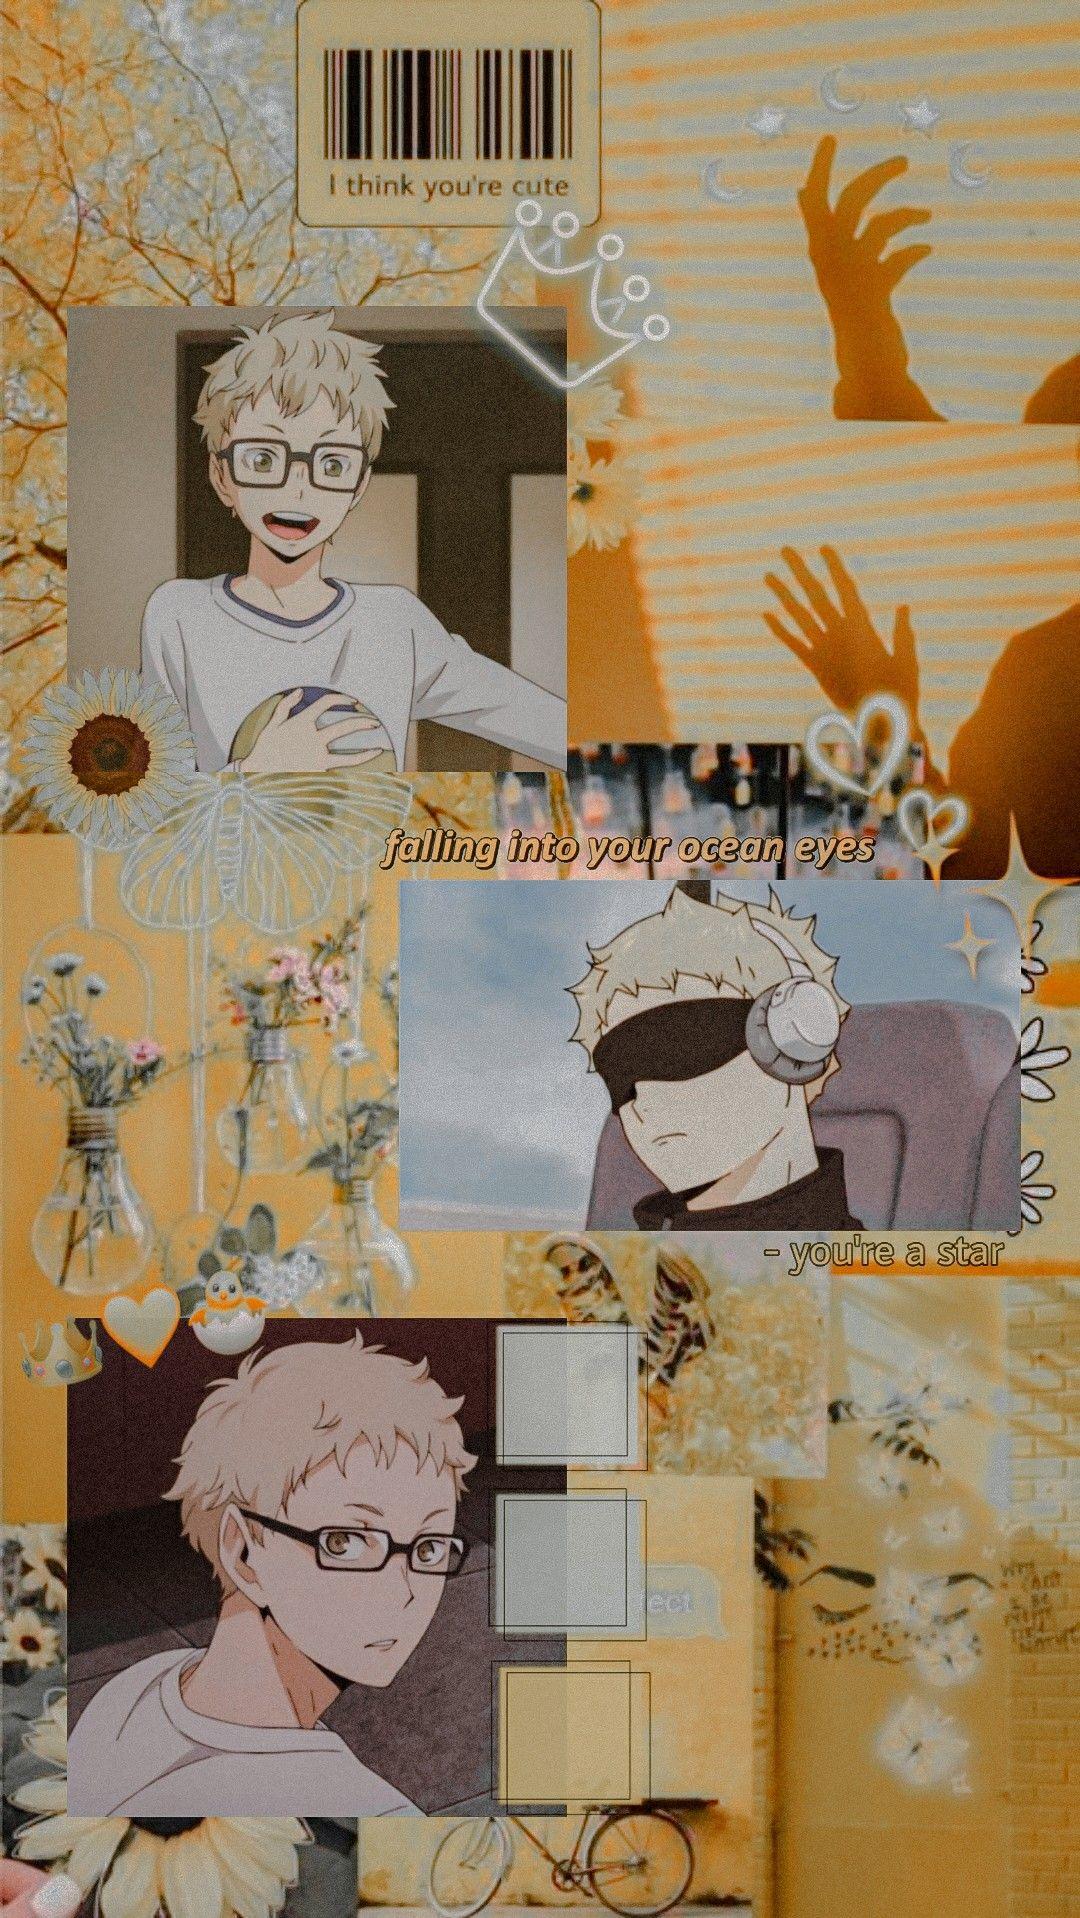 Tsukishima Kei Aesthetic Wallpaper Haikyuu Anime Haikyuu Wallpaper Cute Anime Wallpaper Aesthetic cute haikyuu wallpapers